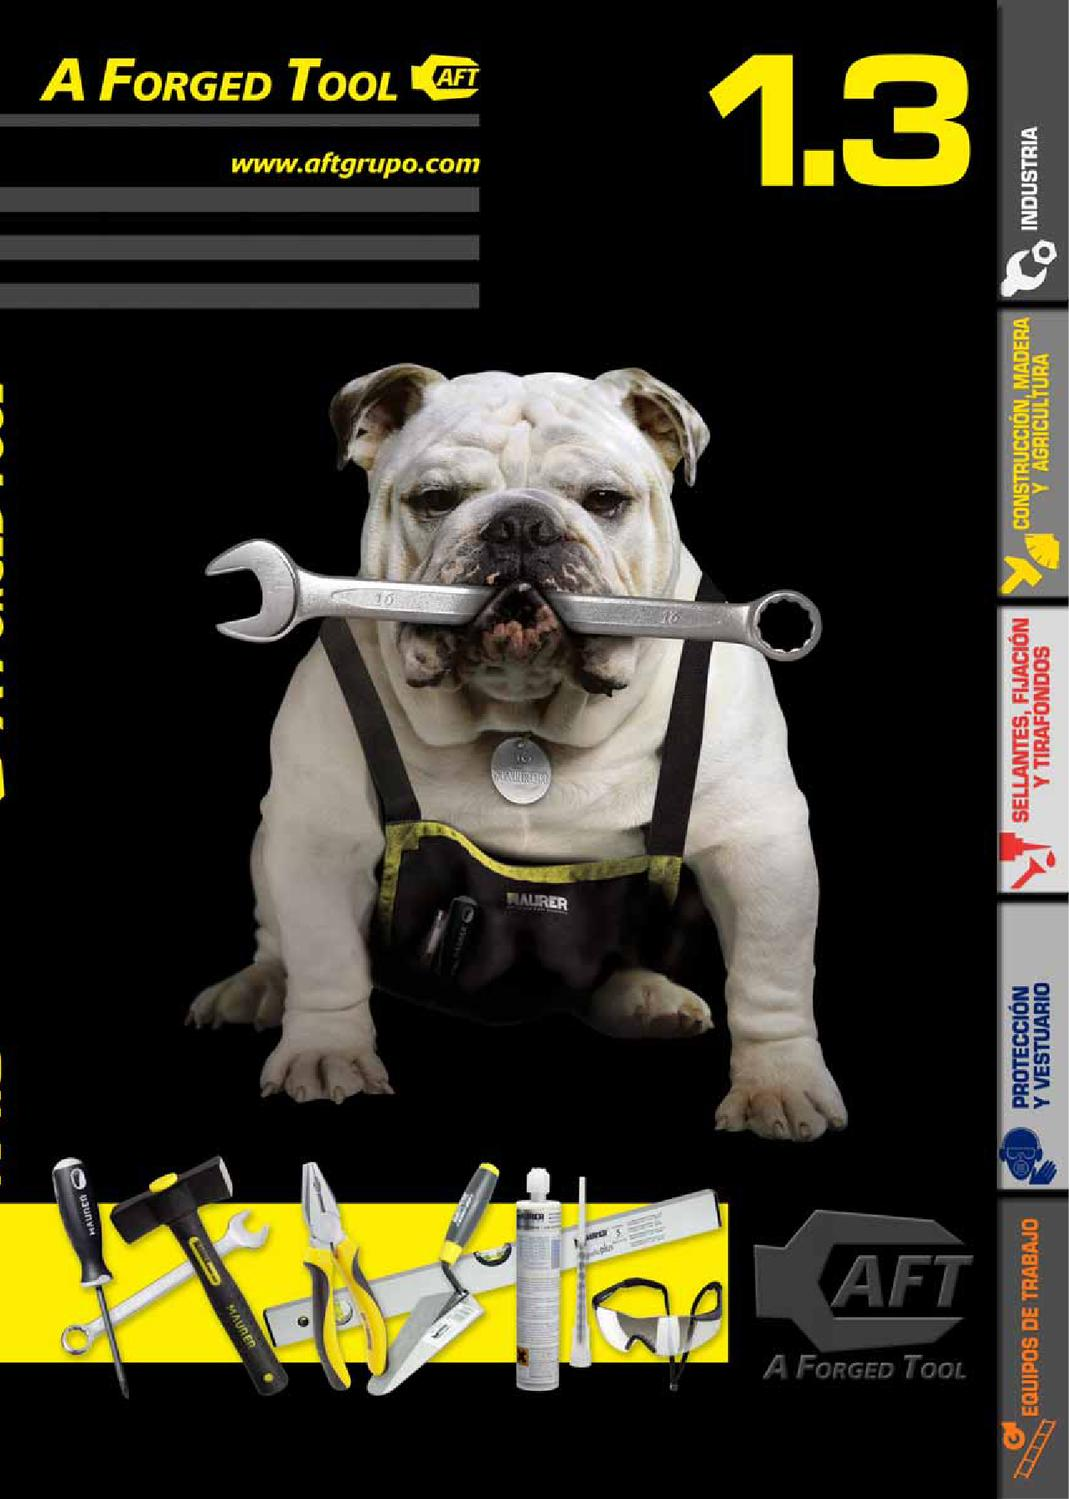 75/mm No marcado Ruedas de goma gris/ /agujero de perno con ruedas de alta resistencia ruedas por Bulldog ruedas/ /Max 200/kg por Set